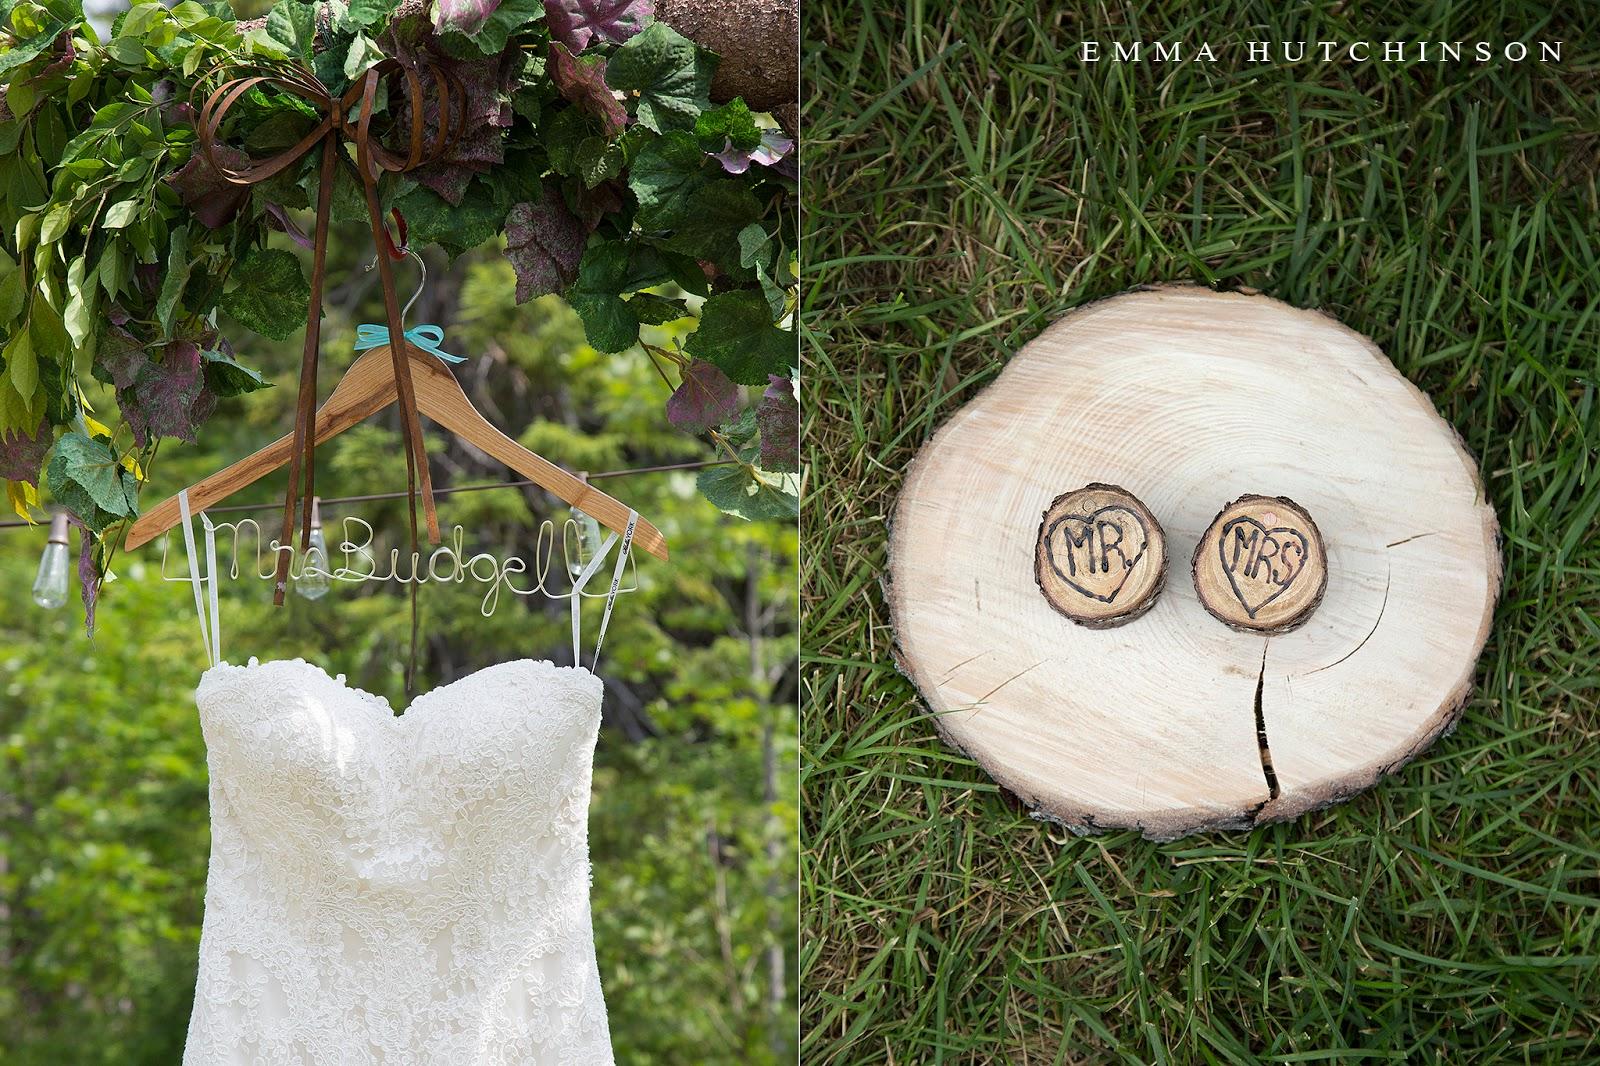 Newfoundland backyard wedding - Mr and Mrs